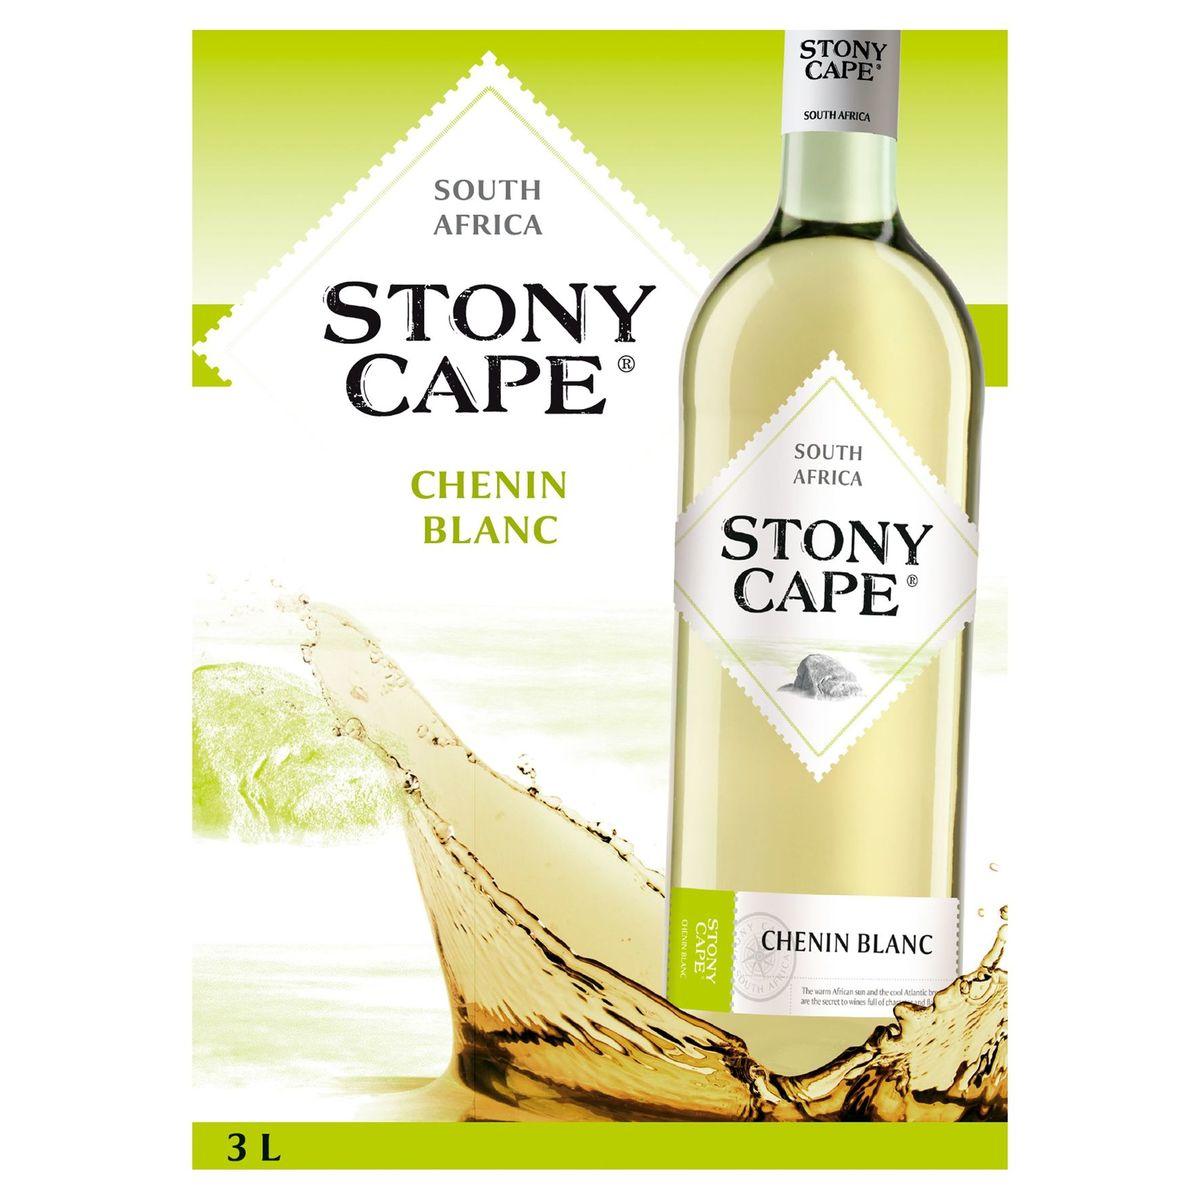 Stony Cape Chenin Blanc 3 L